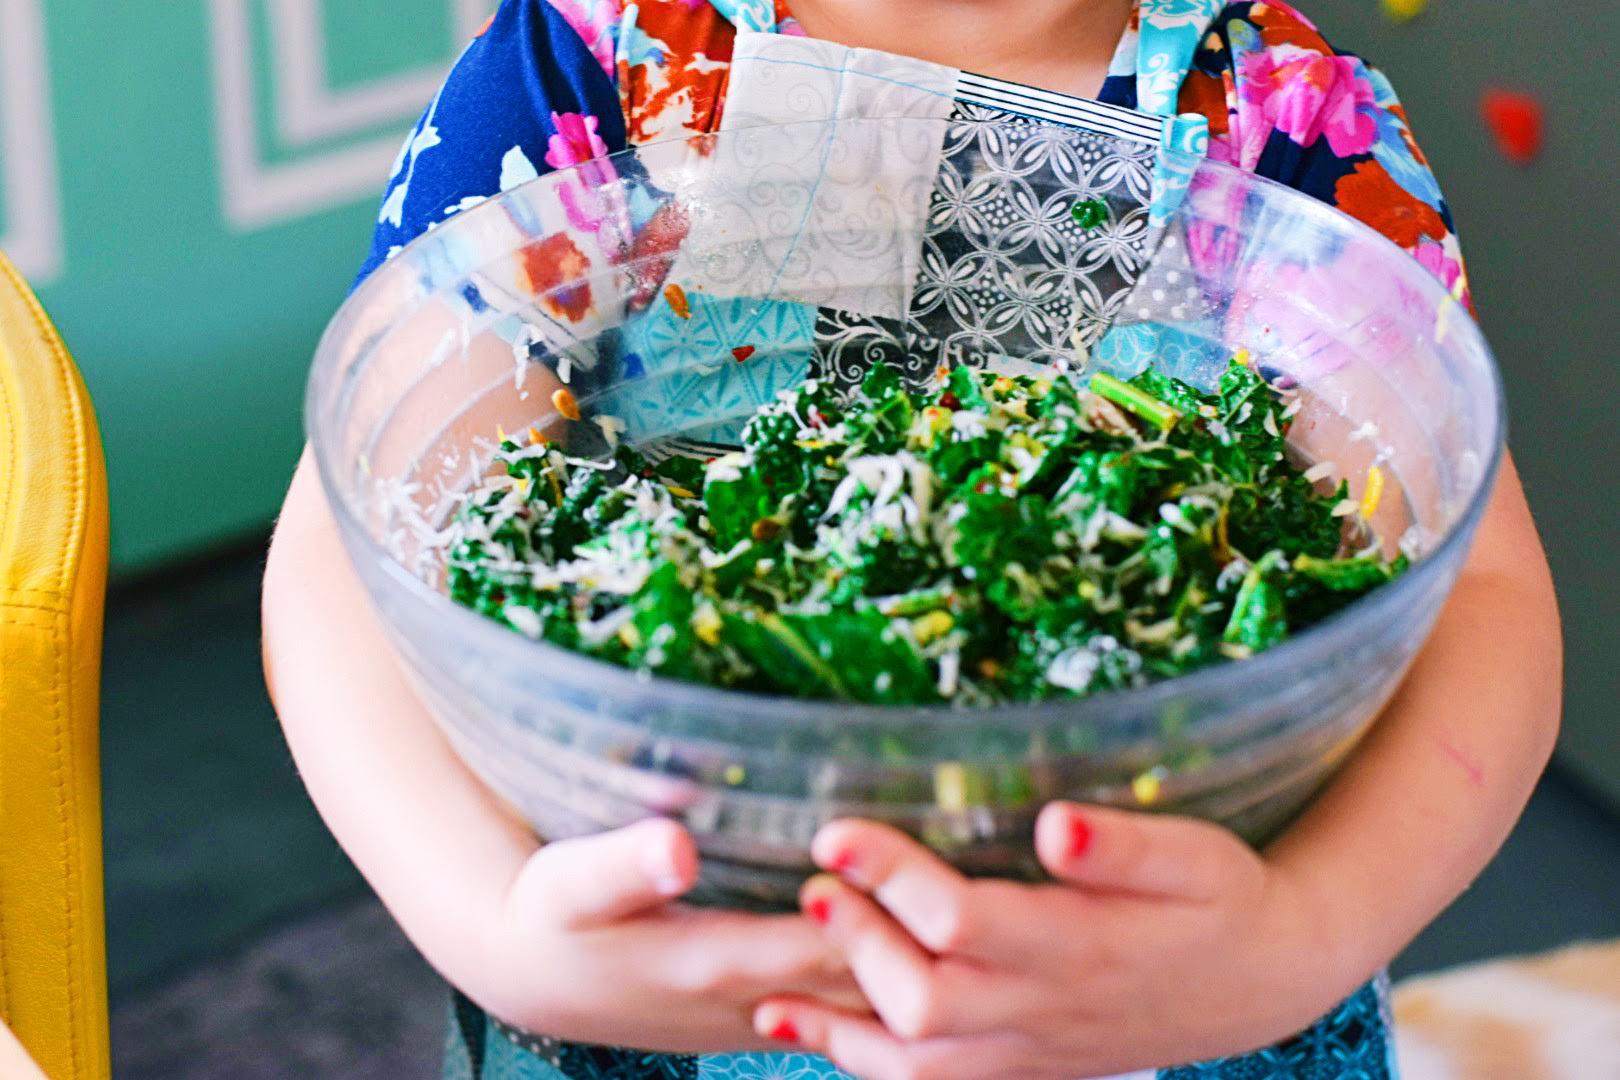 Arcadia inspired Tuscan kale salad